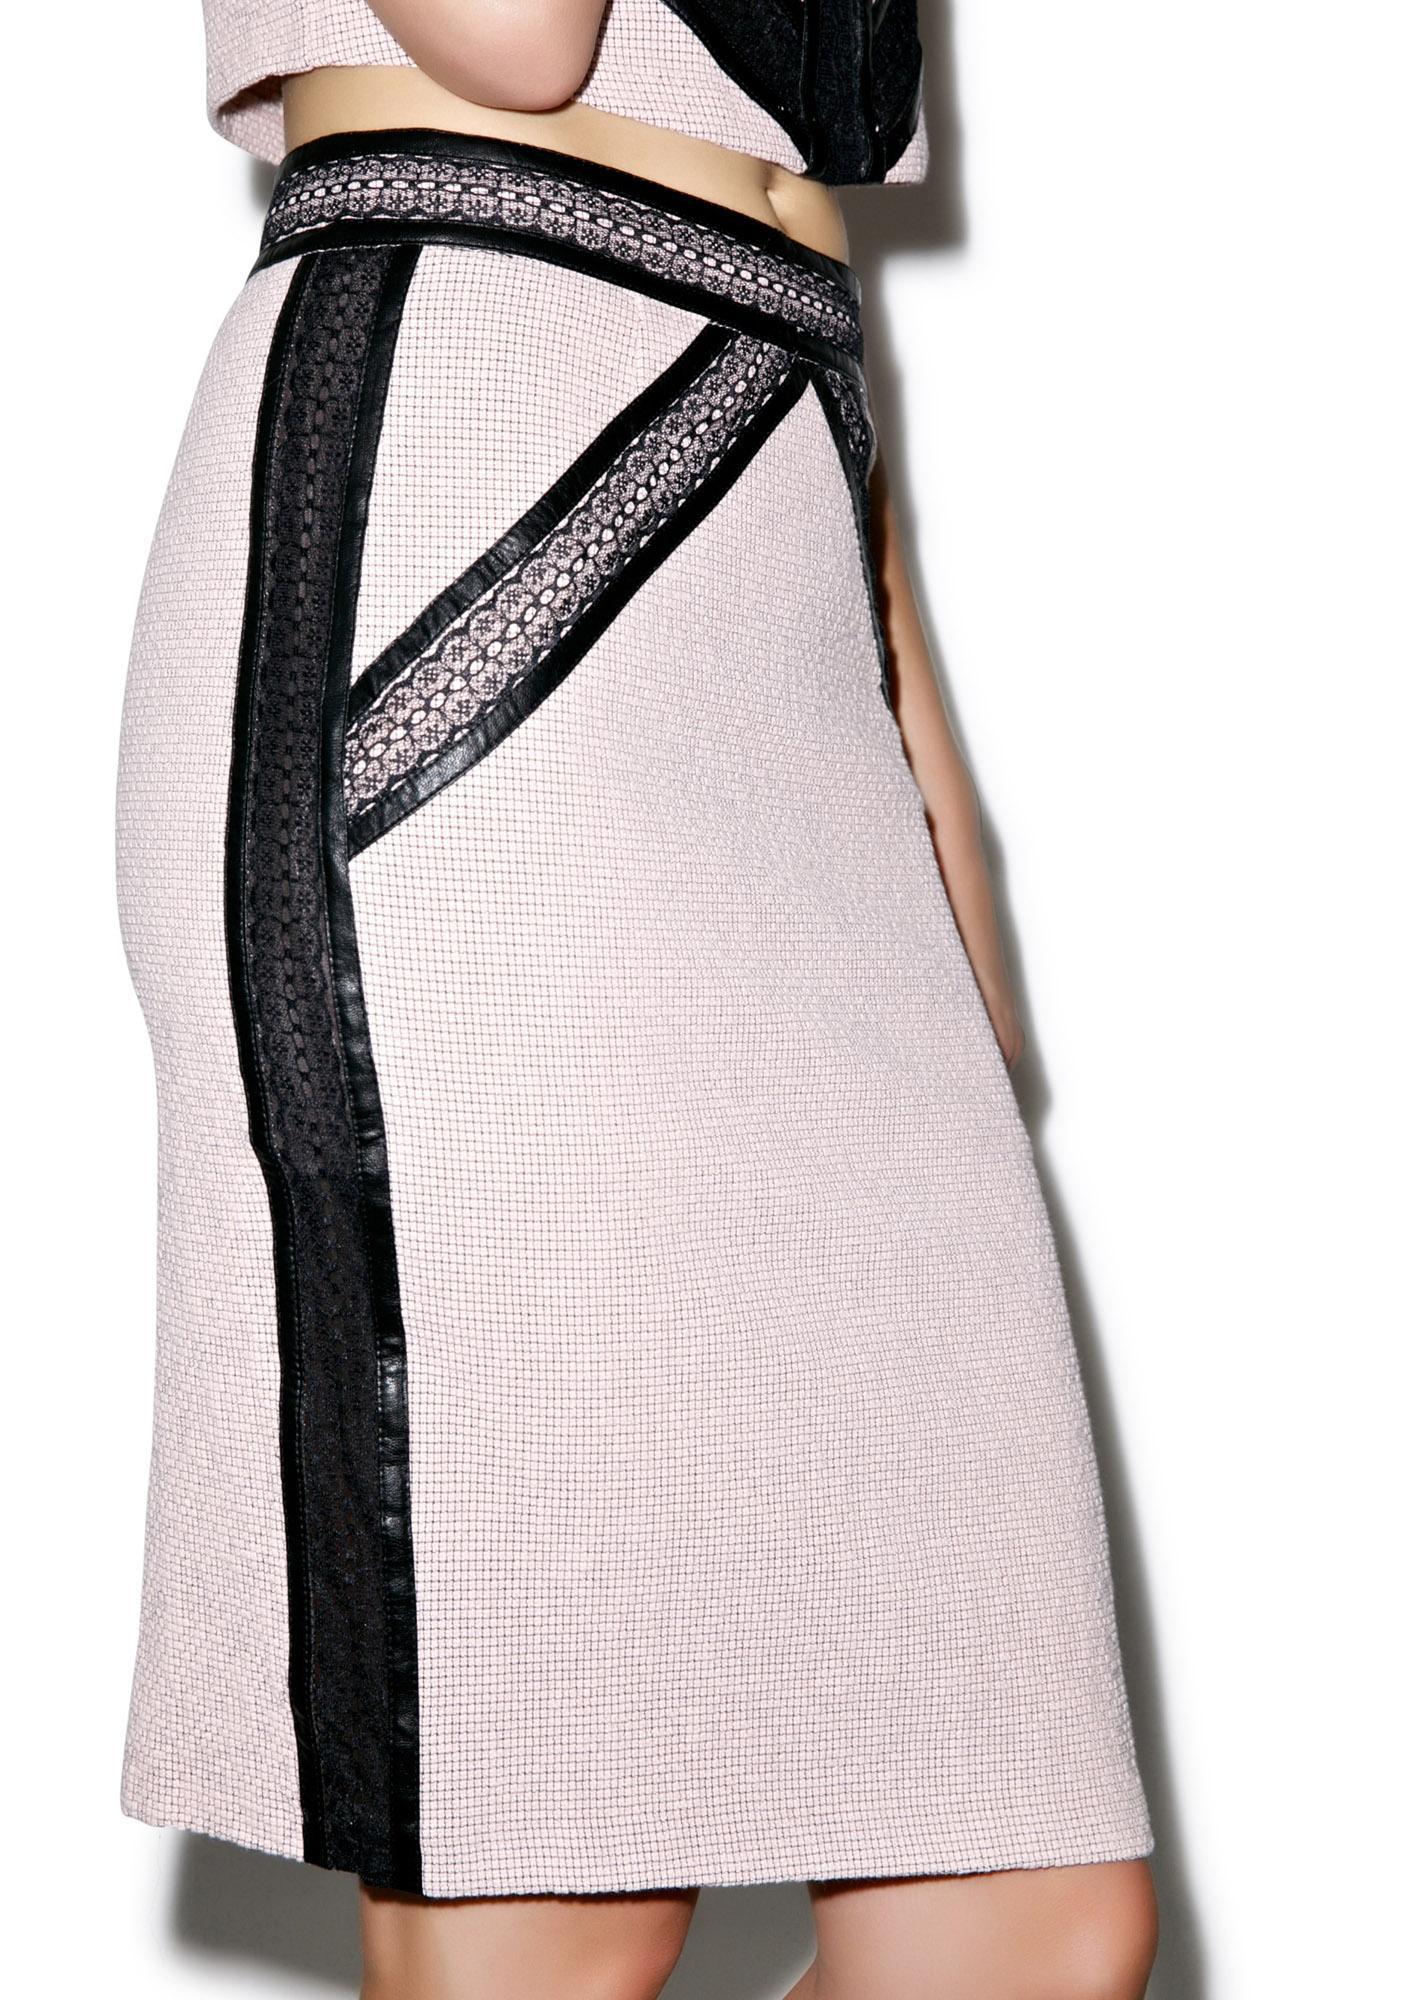 Coco No. 5 Tweed Skirt